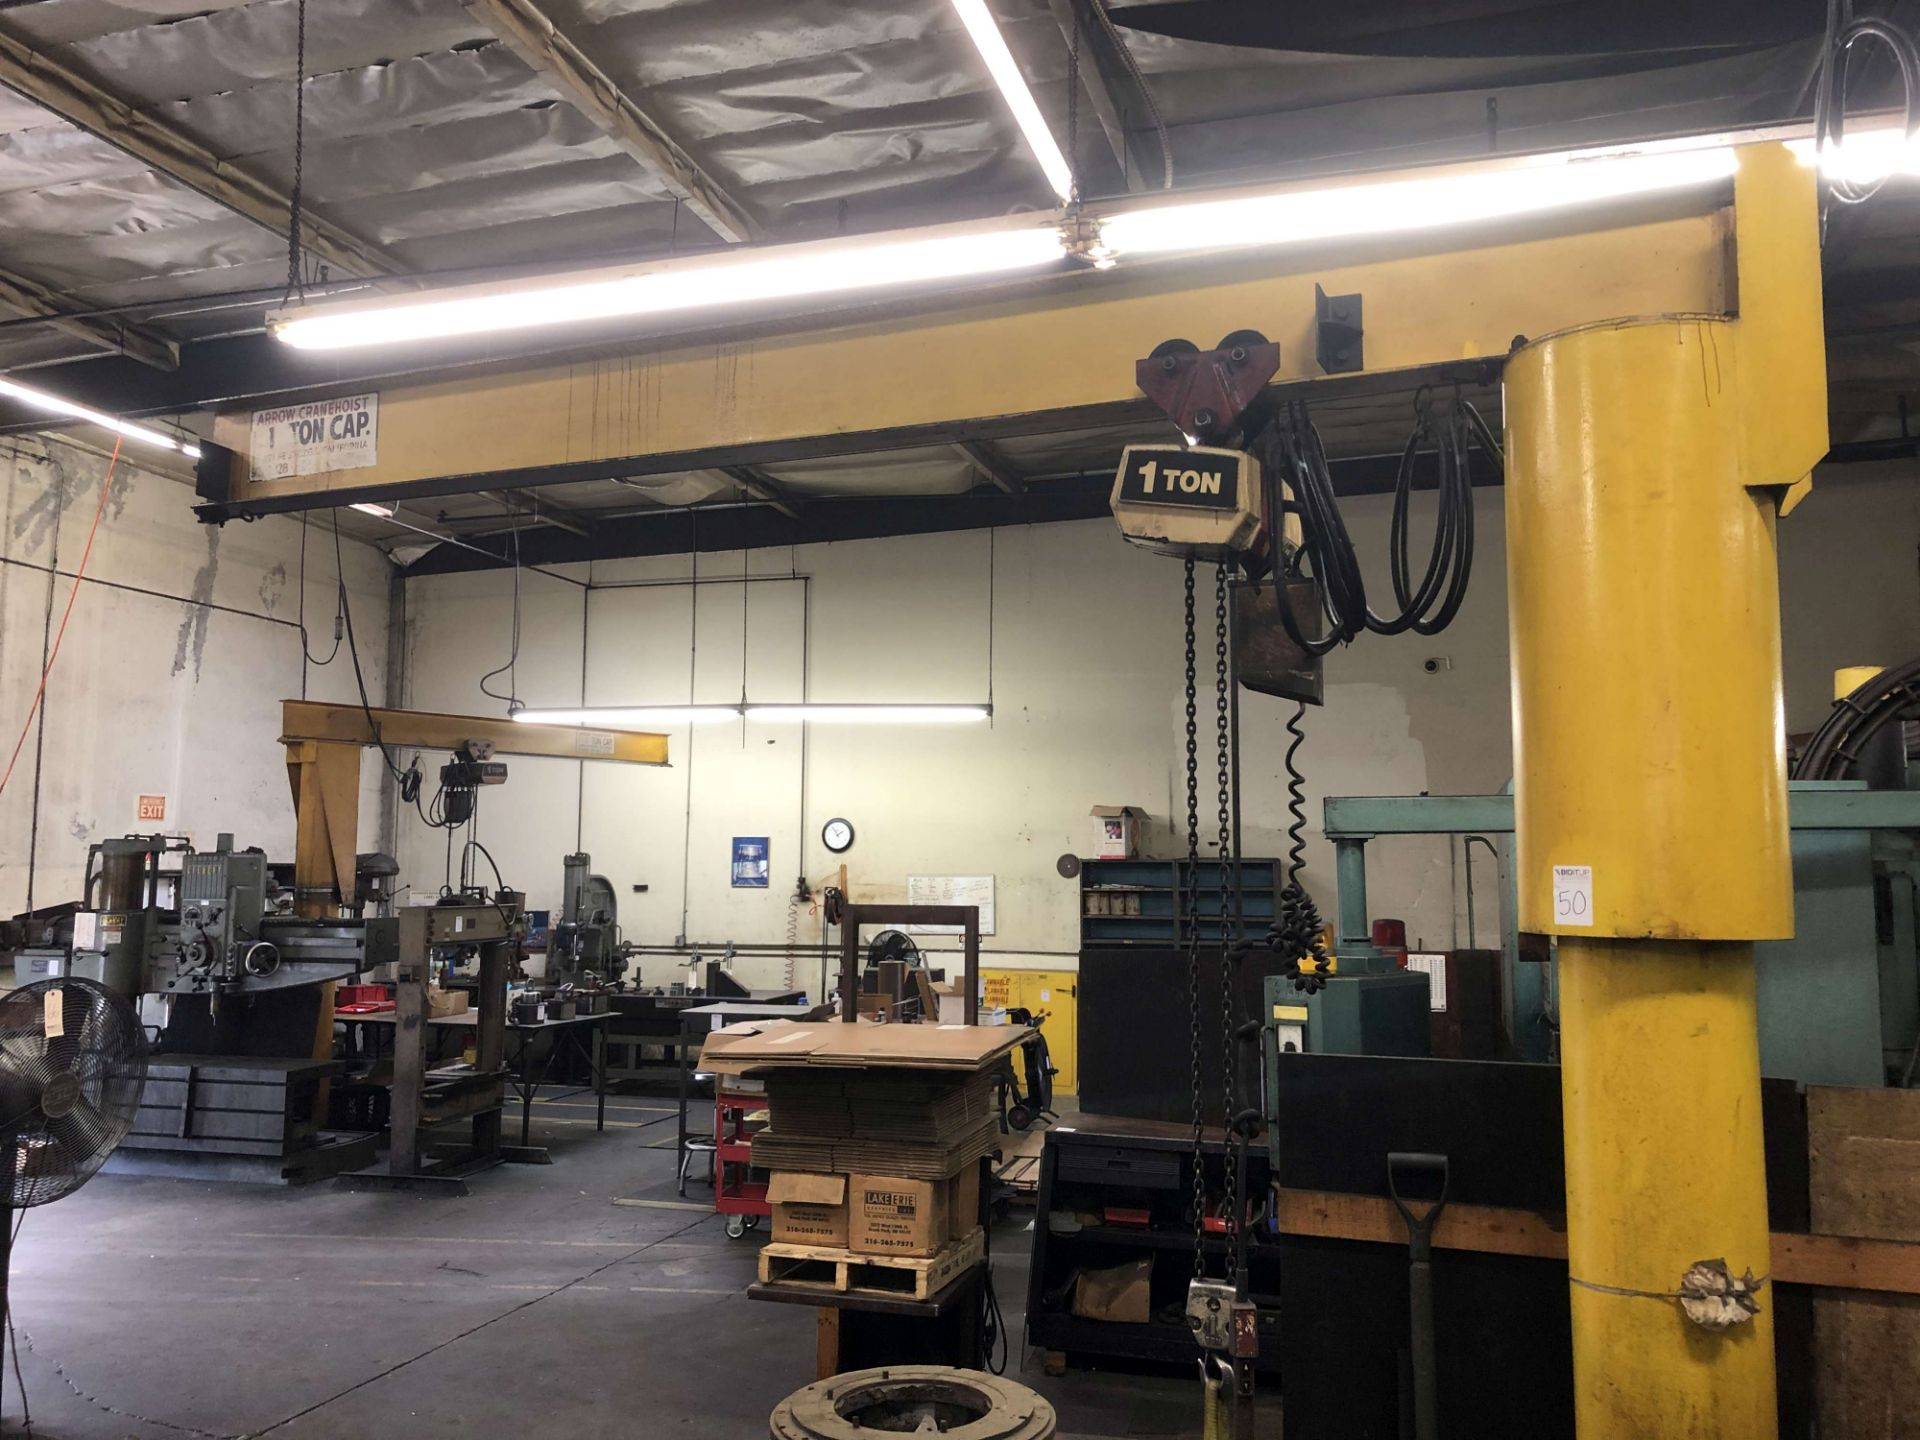 Lot 50 - 1-Ton Capacity Arrow Cranehoist Jib Crane (12' Arm x 10' High), w/ Coffing 1-Ton Hoist, Pendant